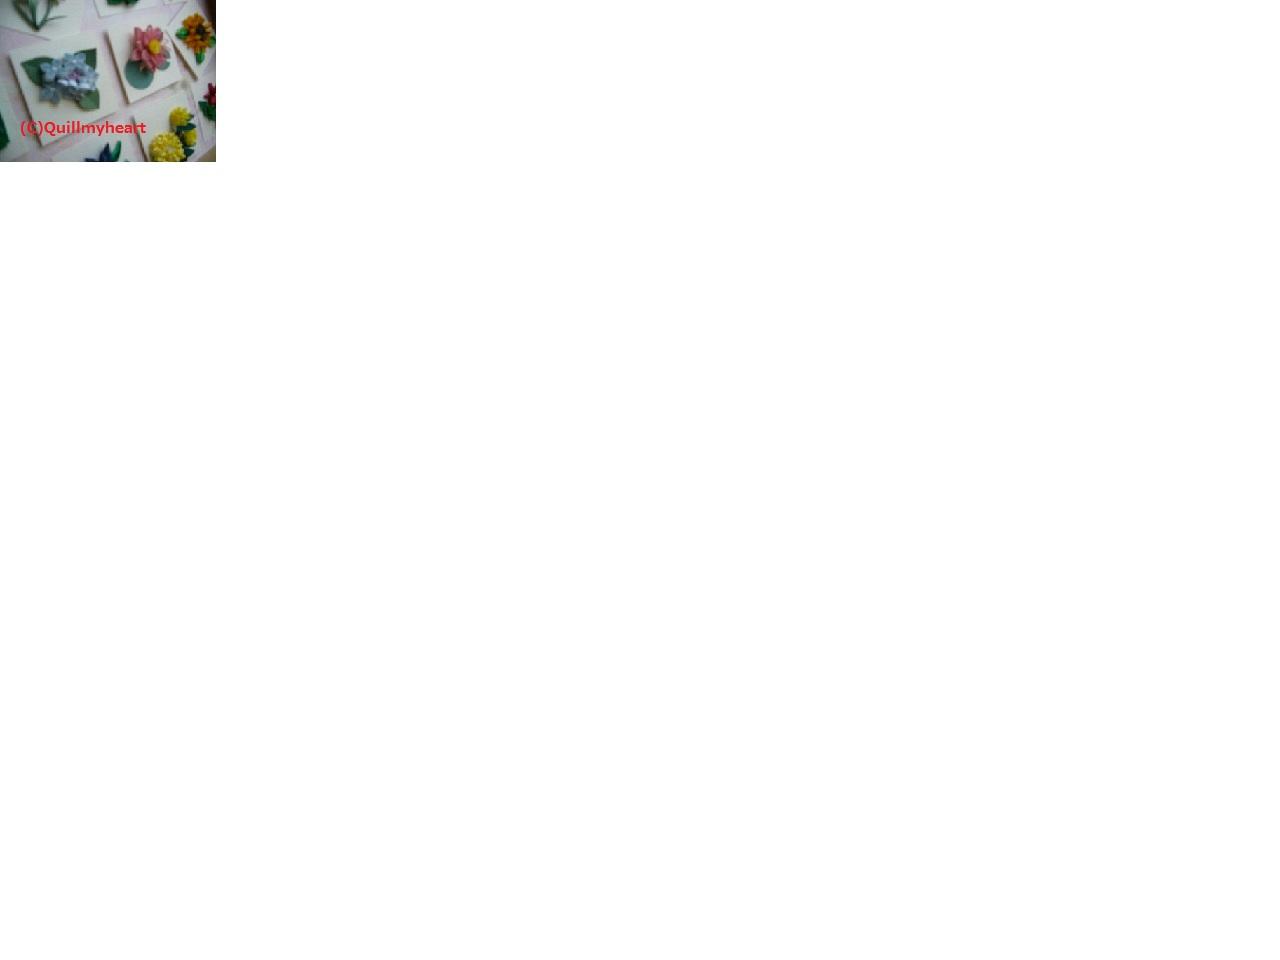 petitflowersampler.jpg